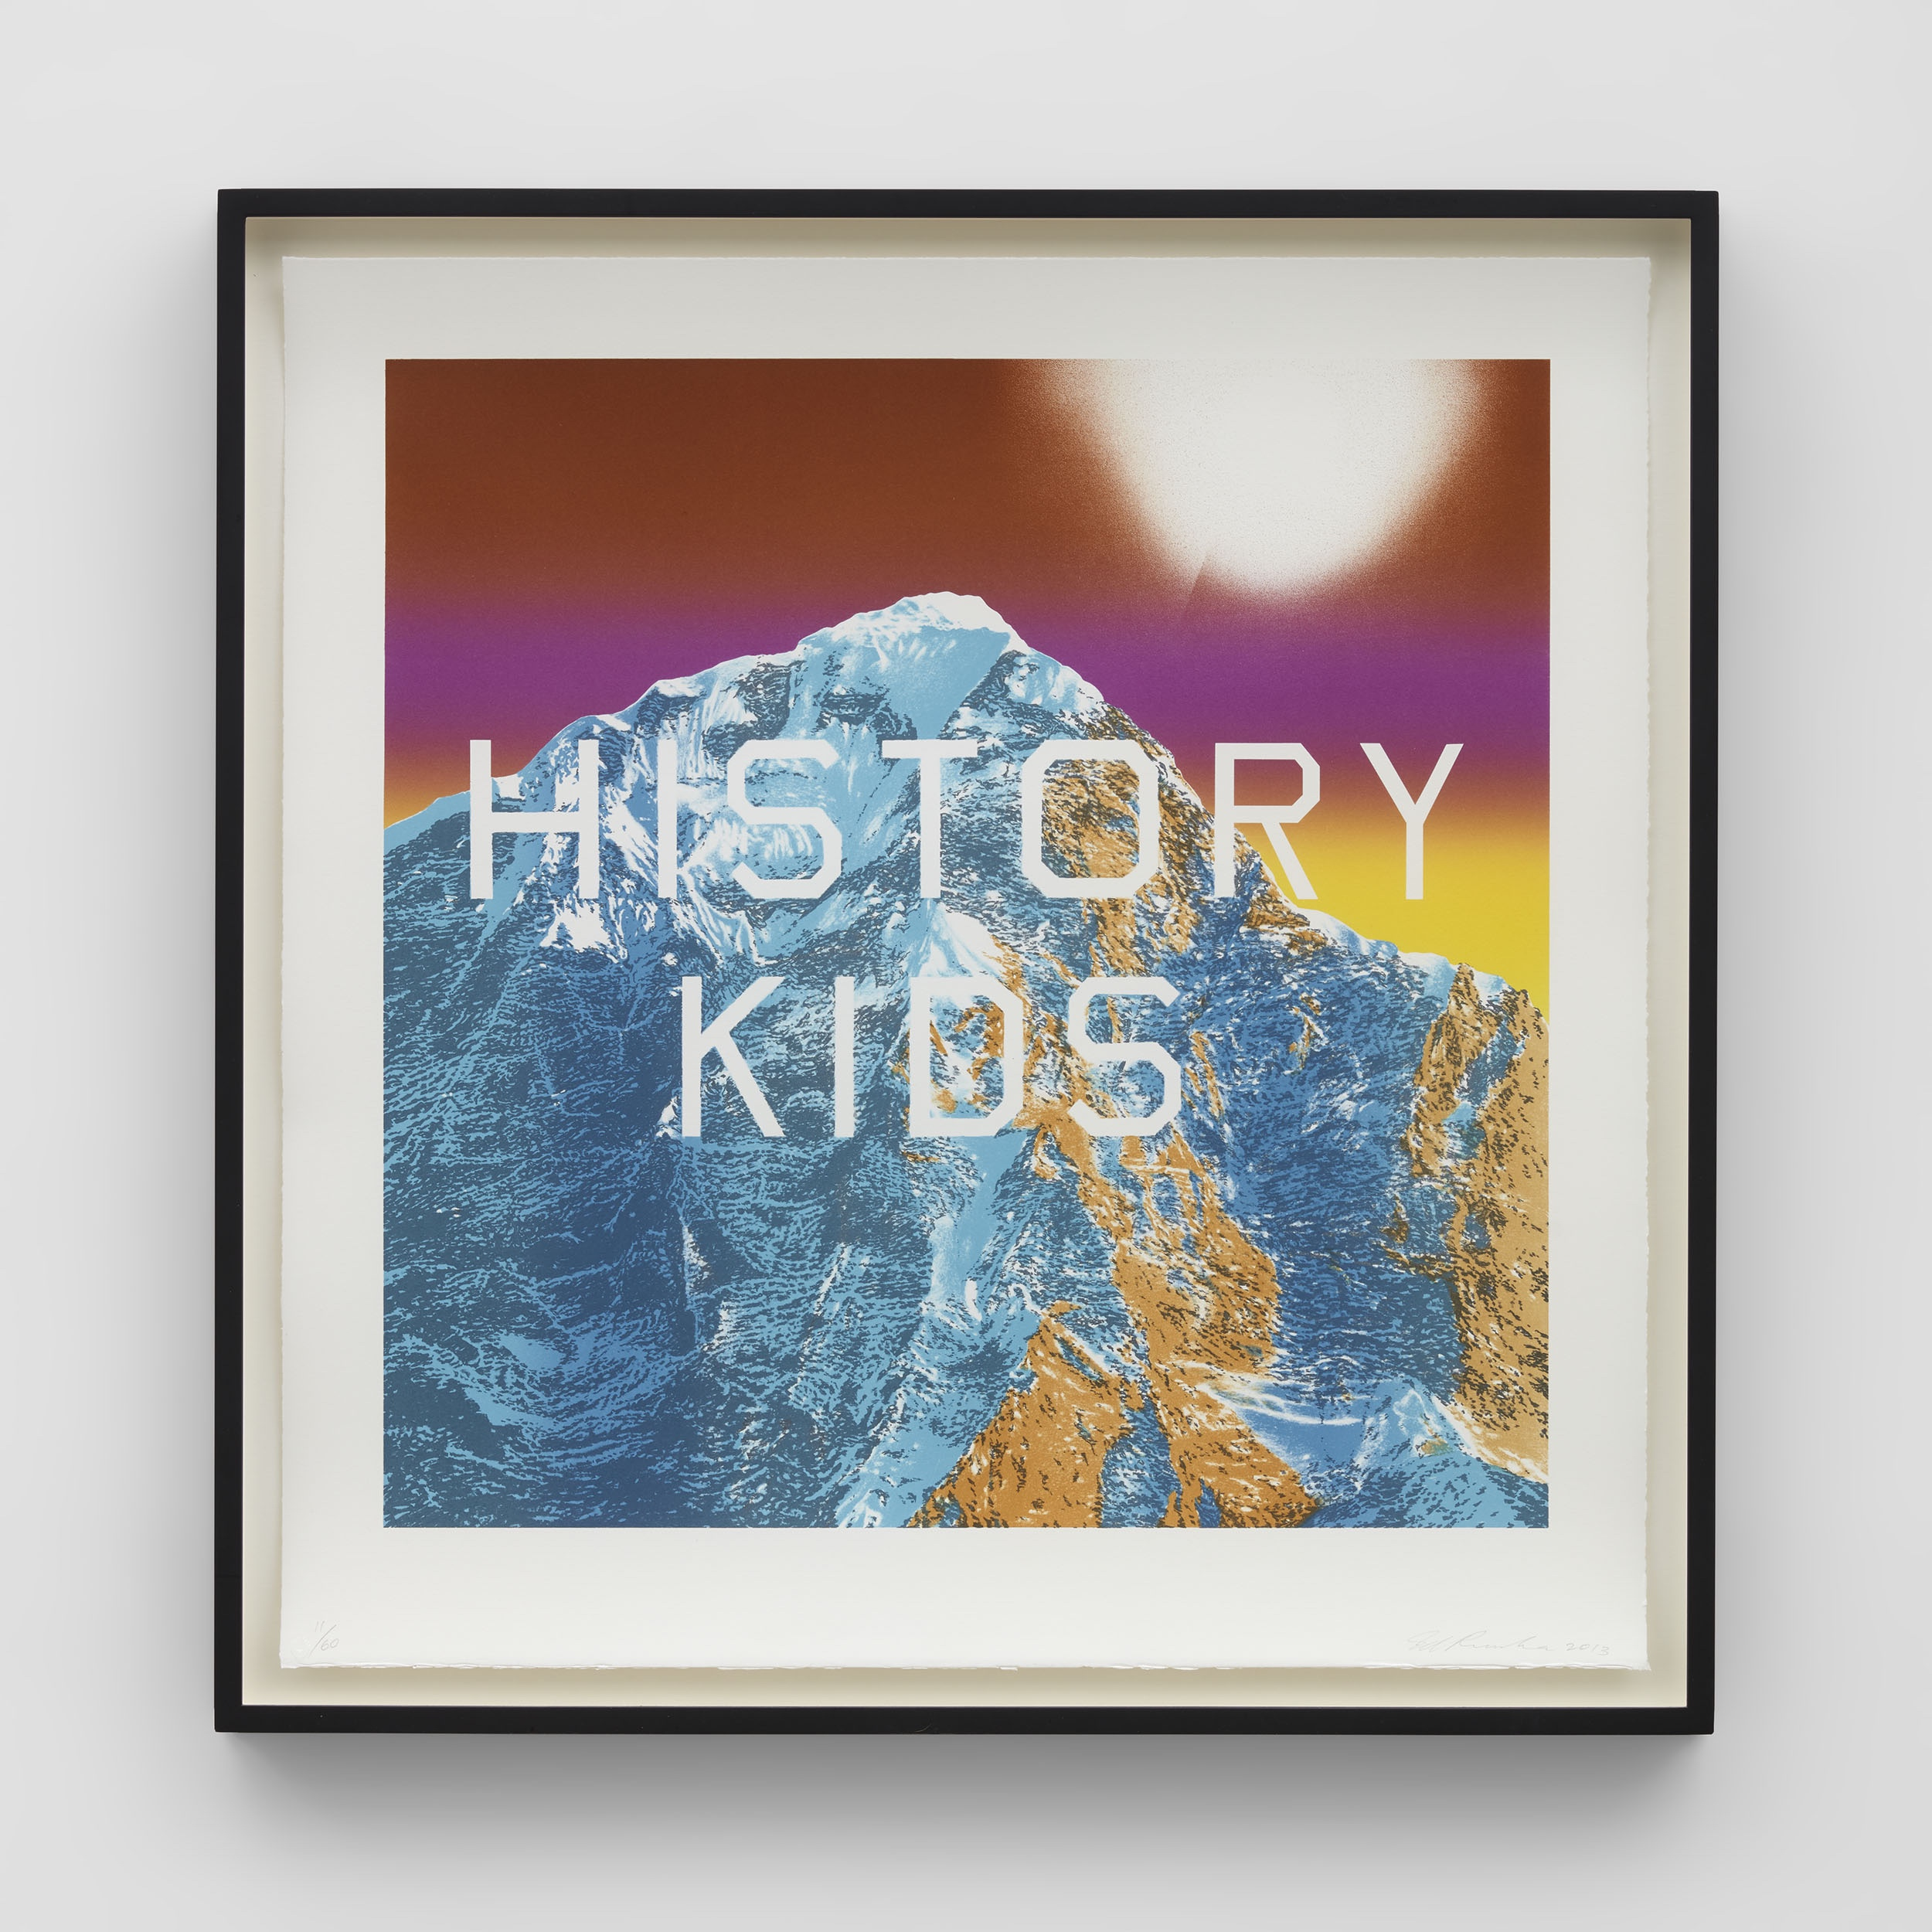 Ed Ruscha History Kids